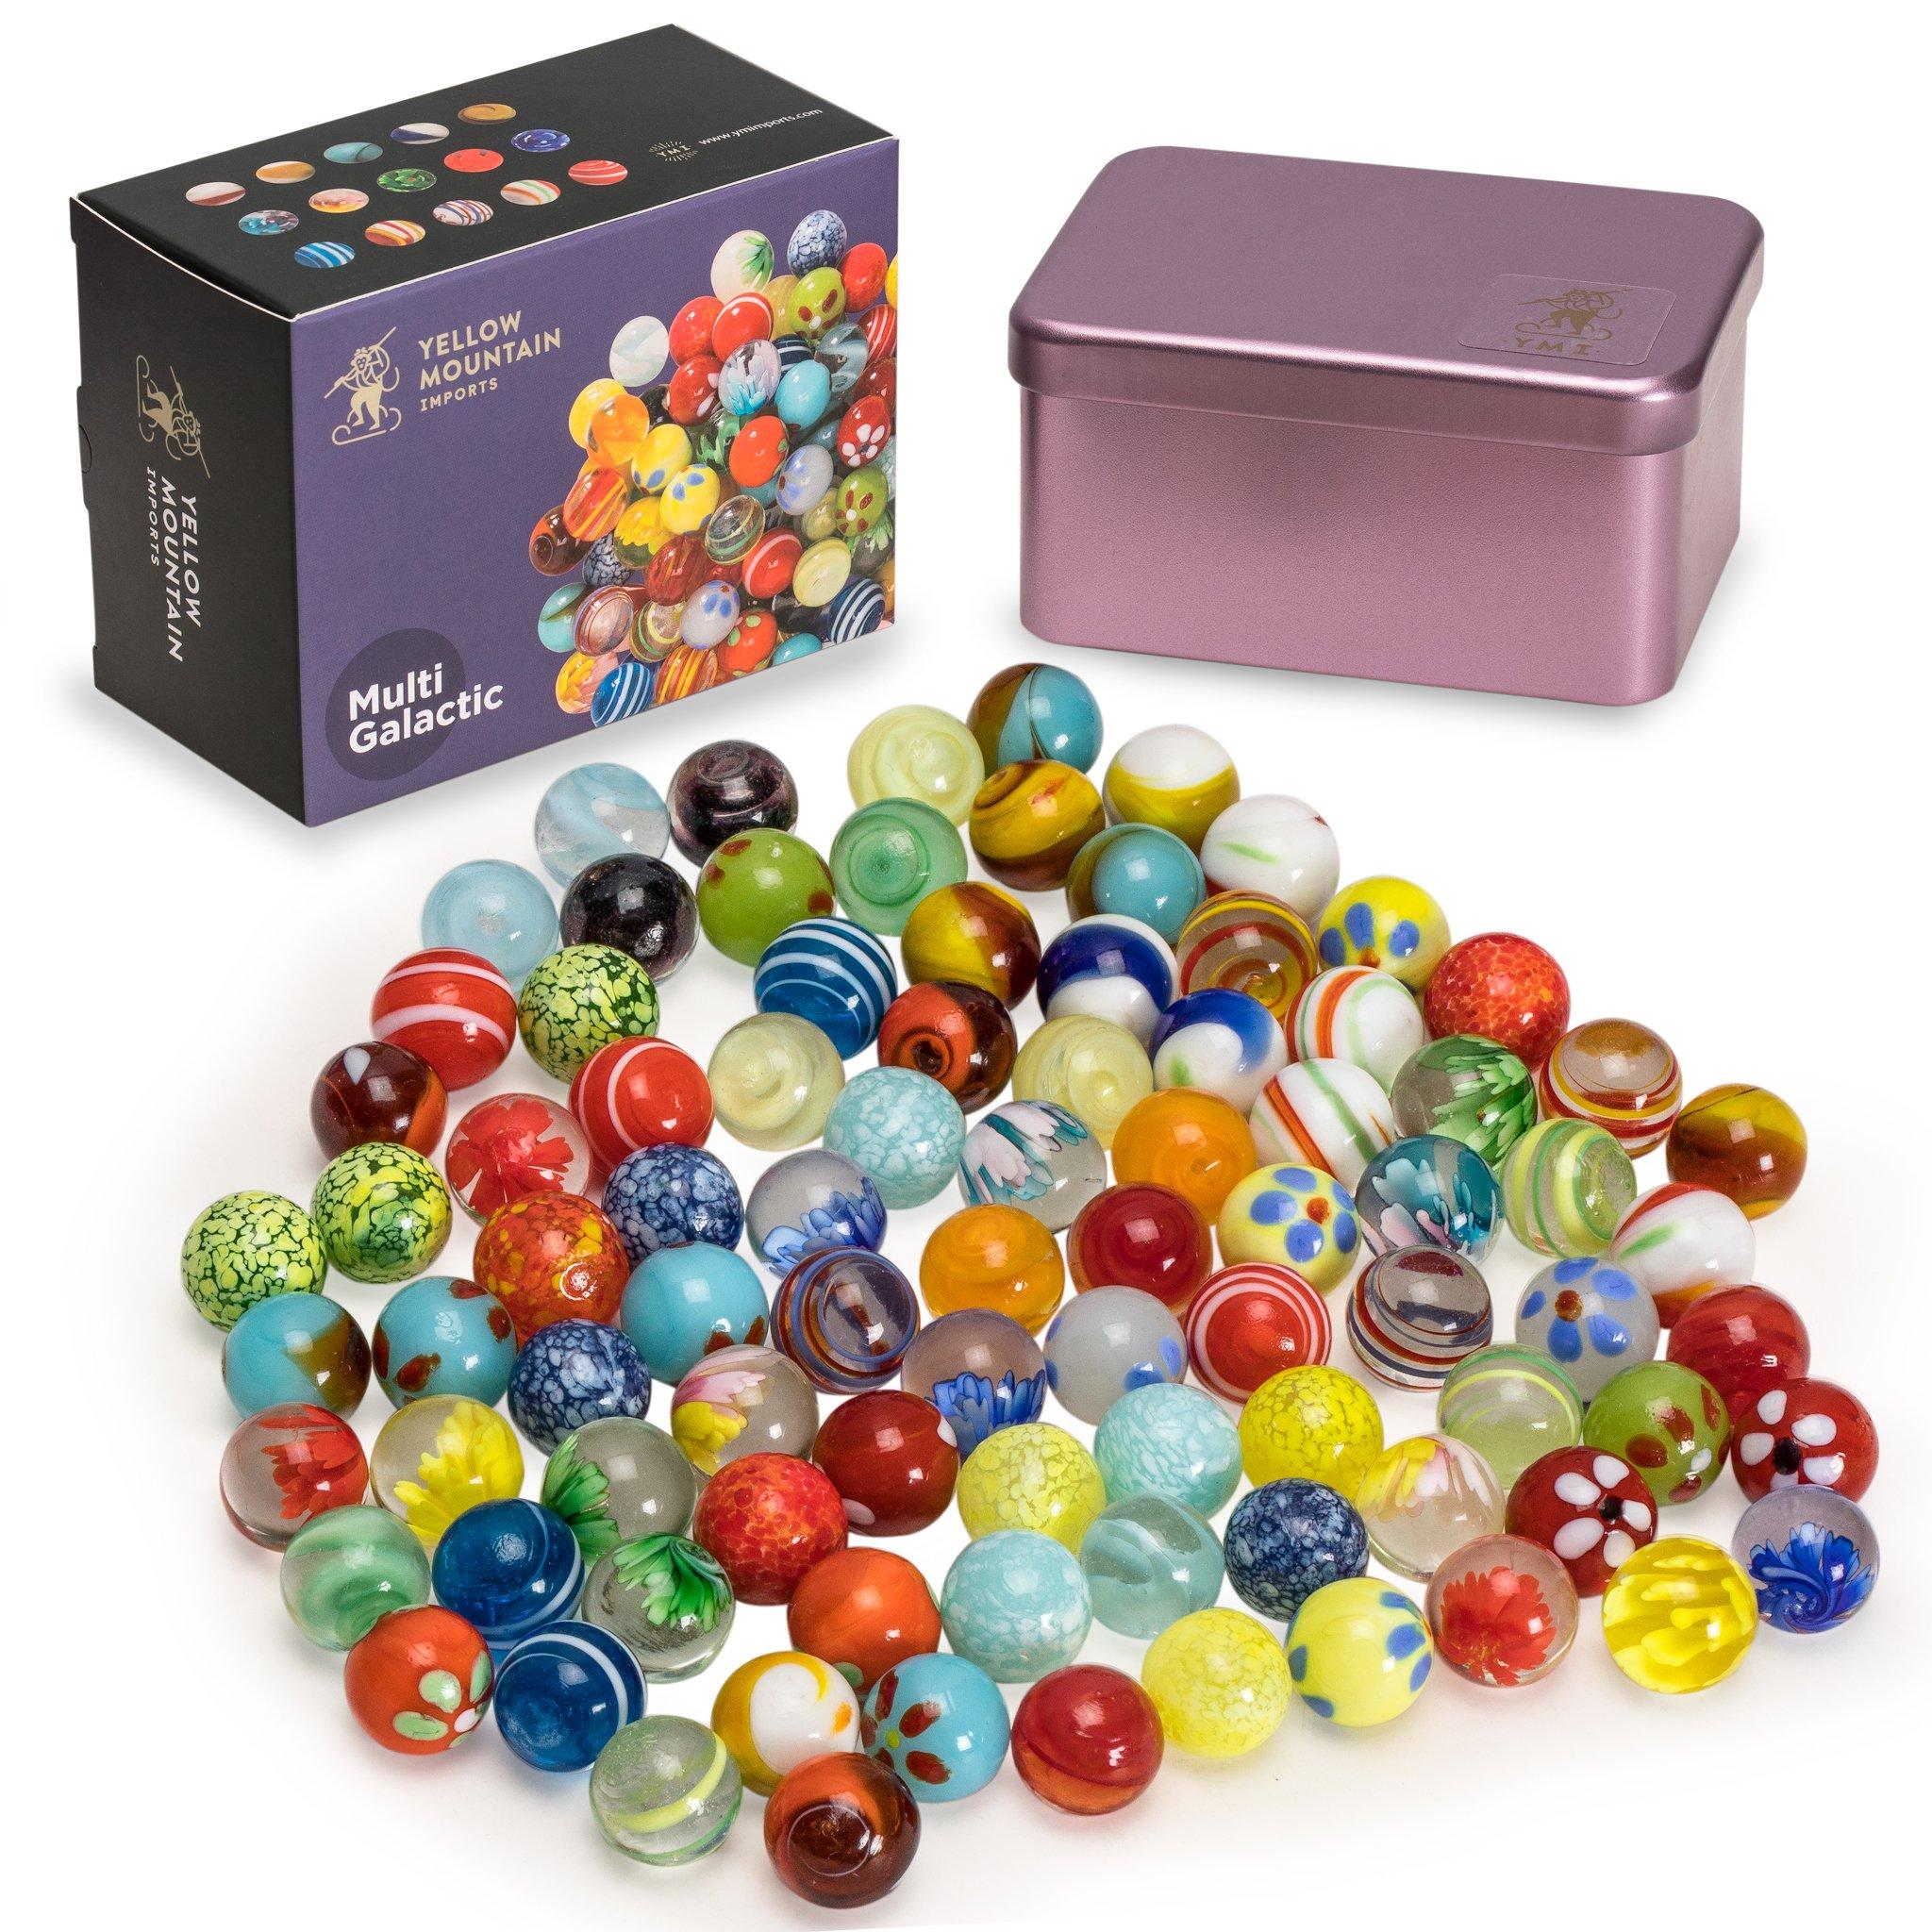 Yellow Mountain Imports Marbles Set in Tin Box, Multi Galactic